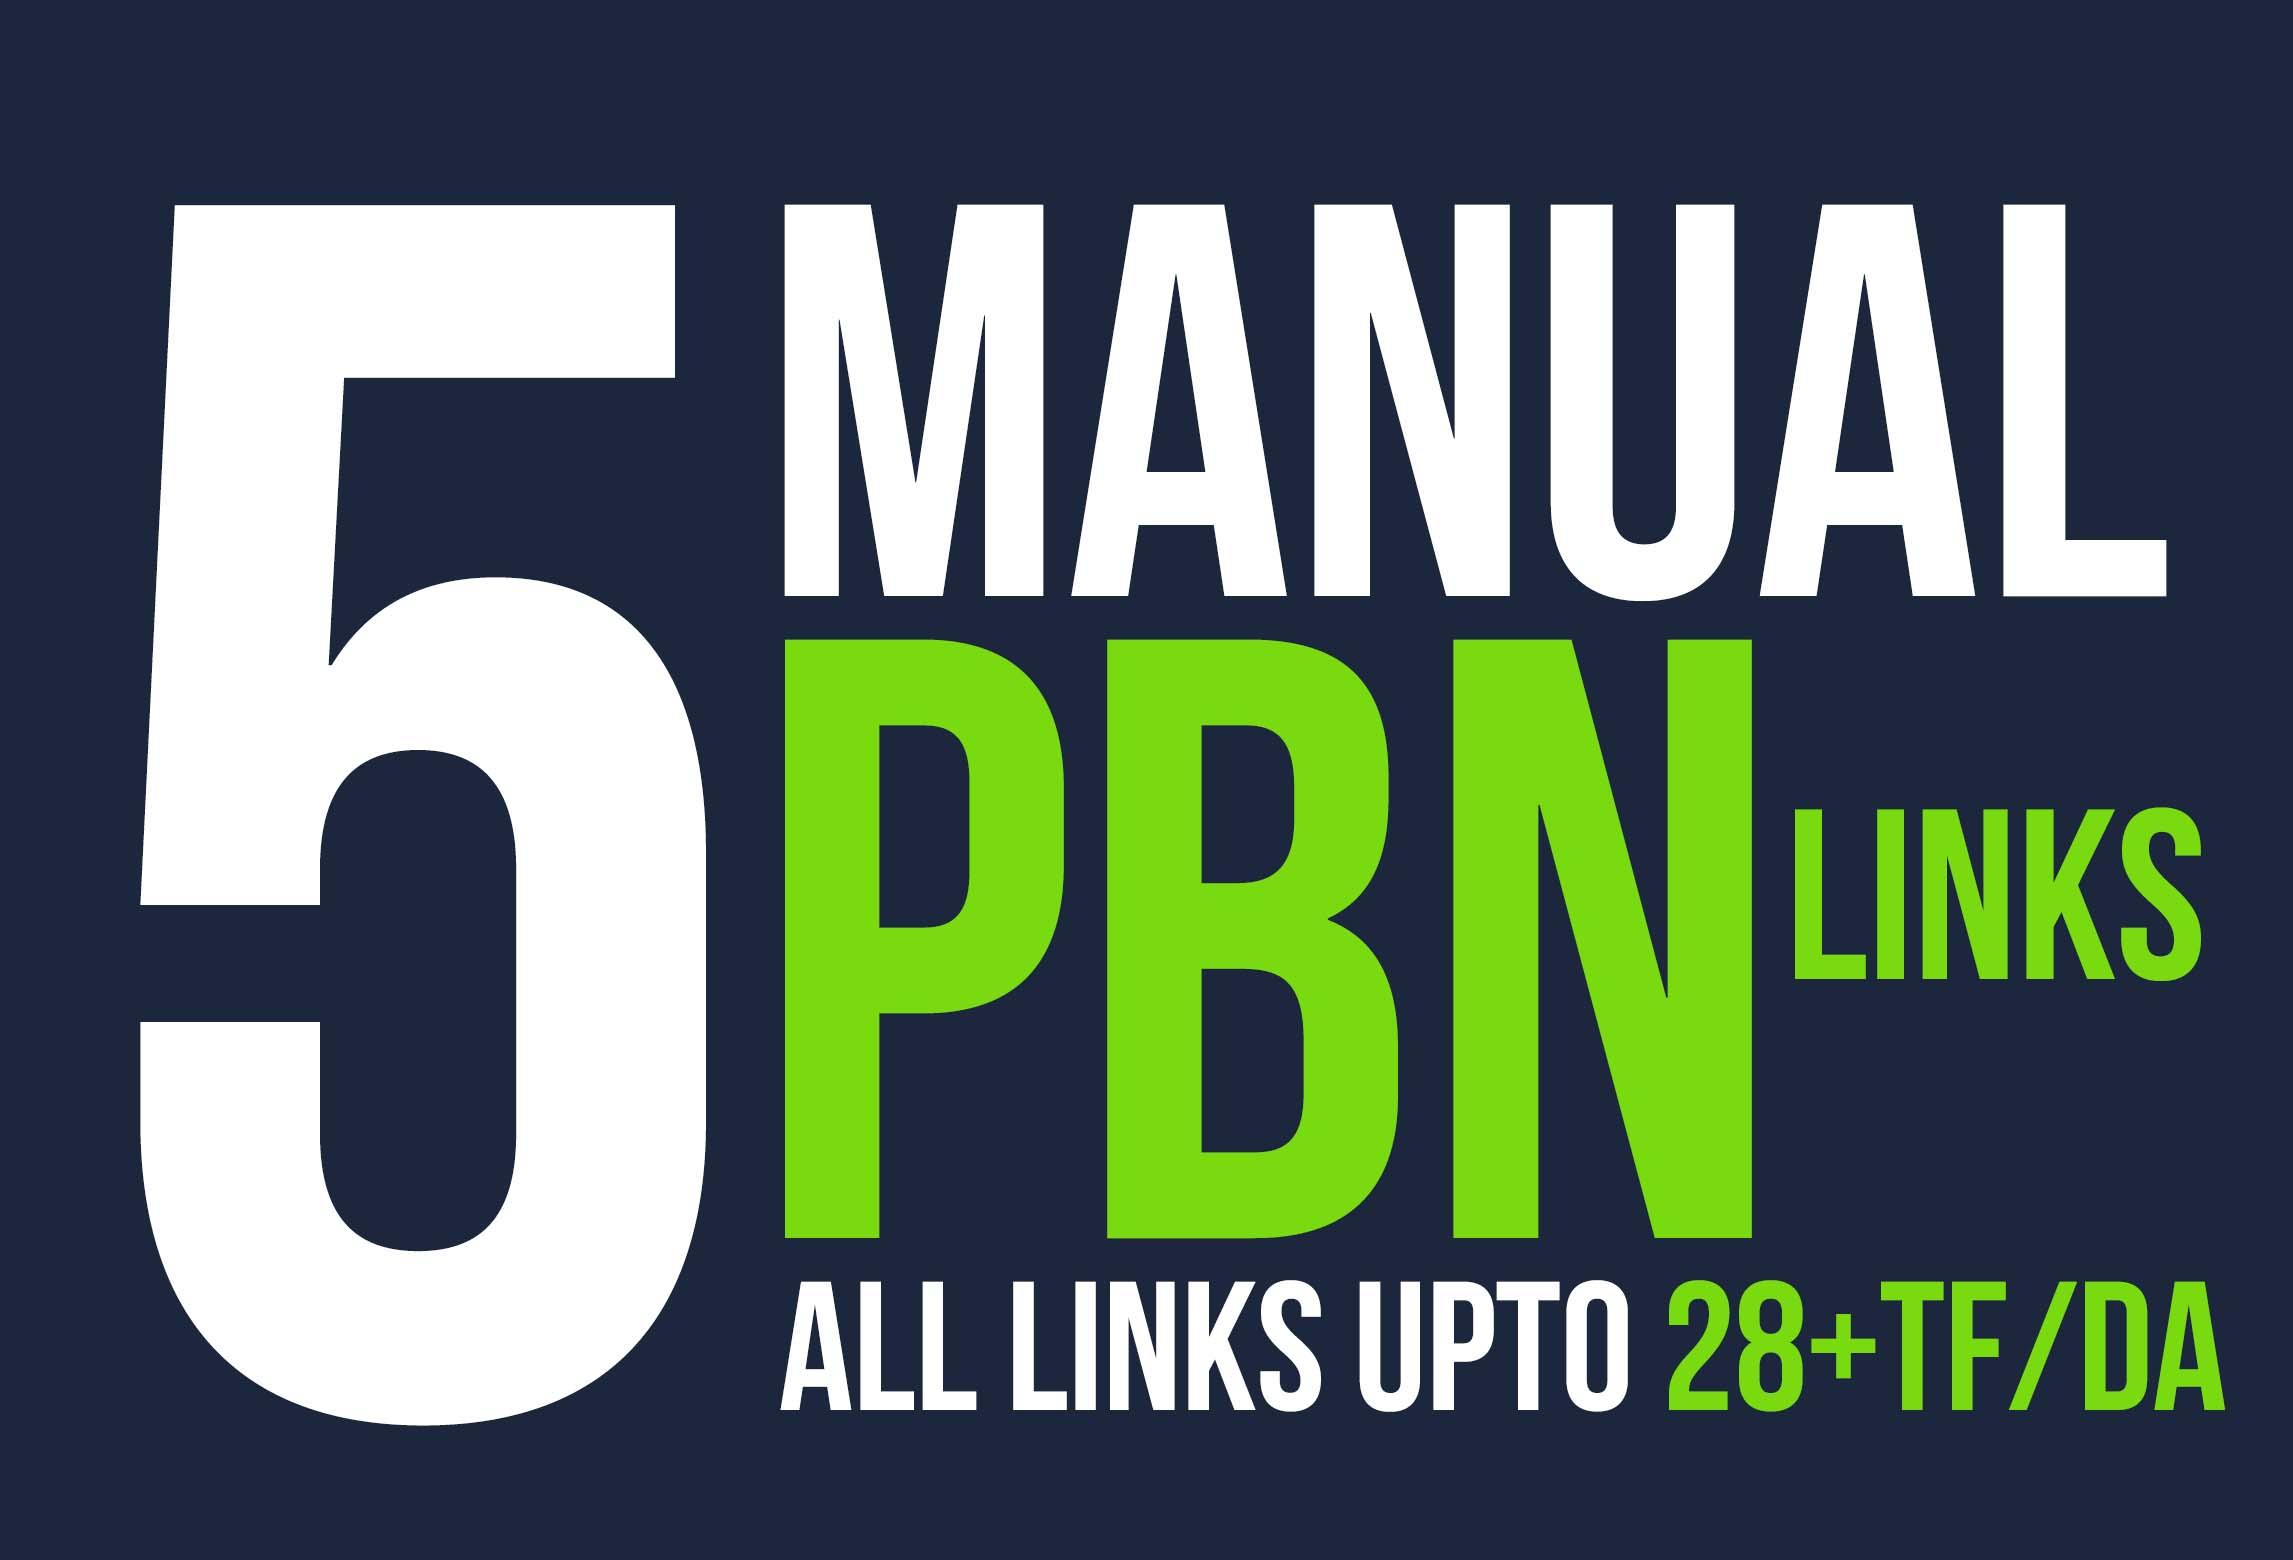 We Will Provide 5 Powerfull Homepage Pbn Backlinks